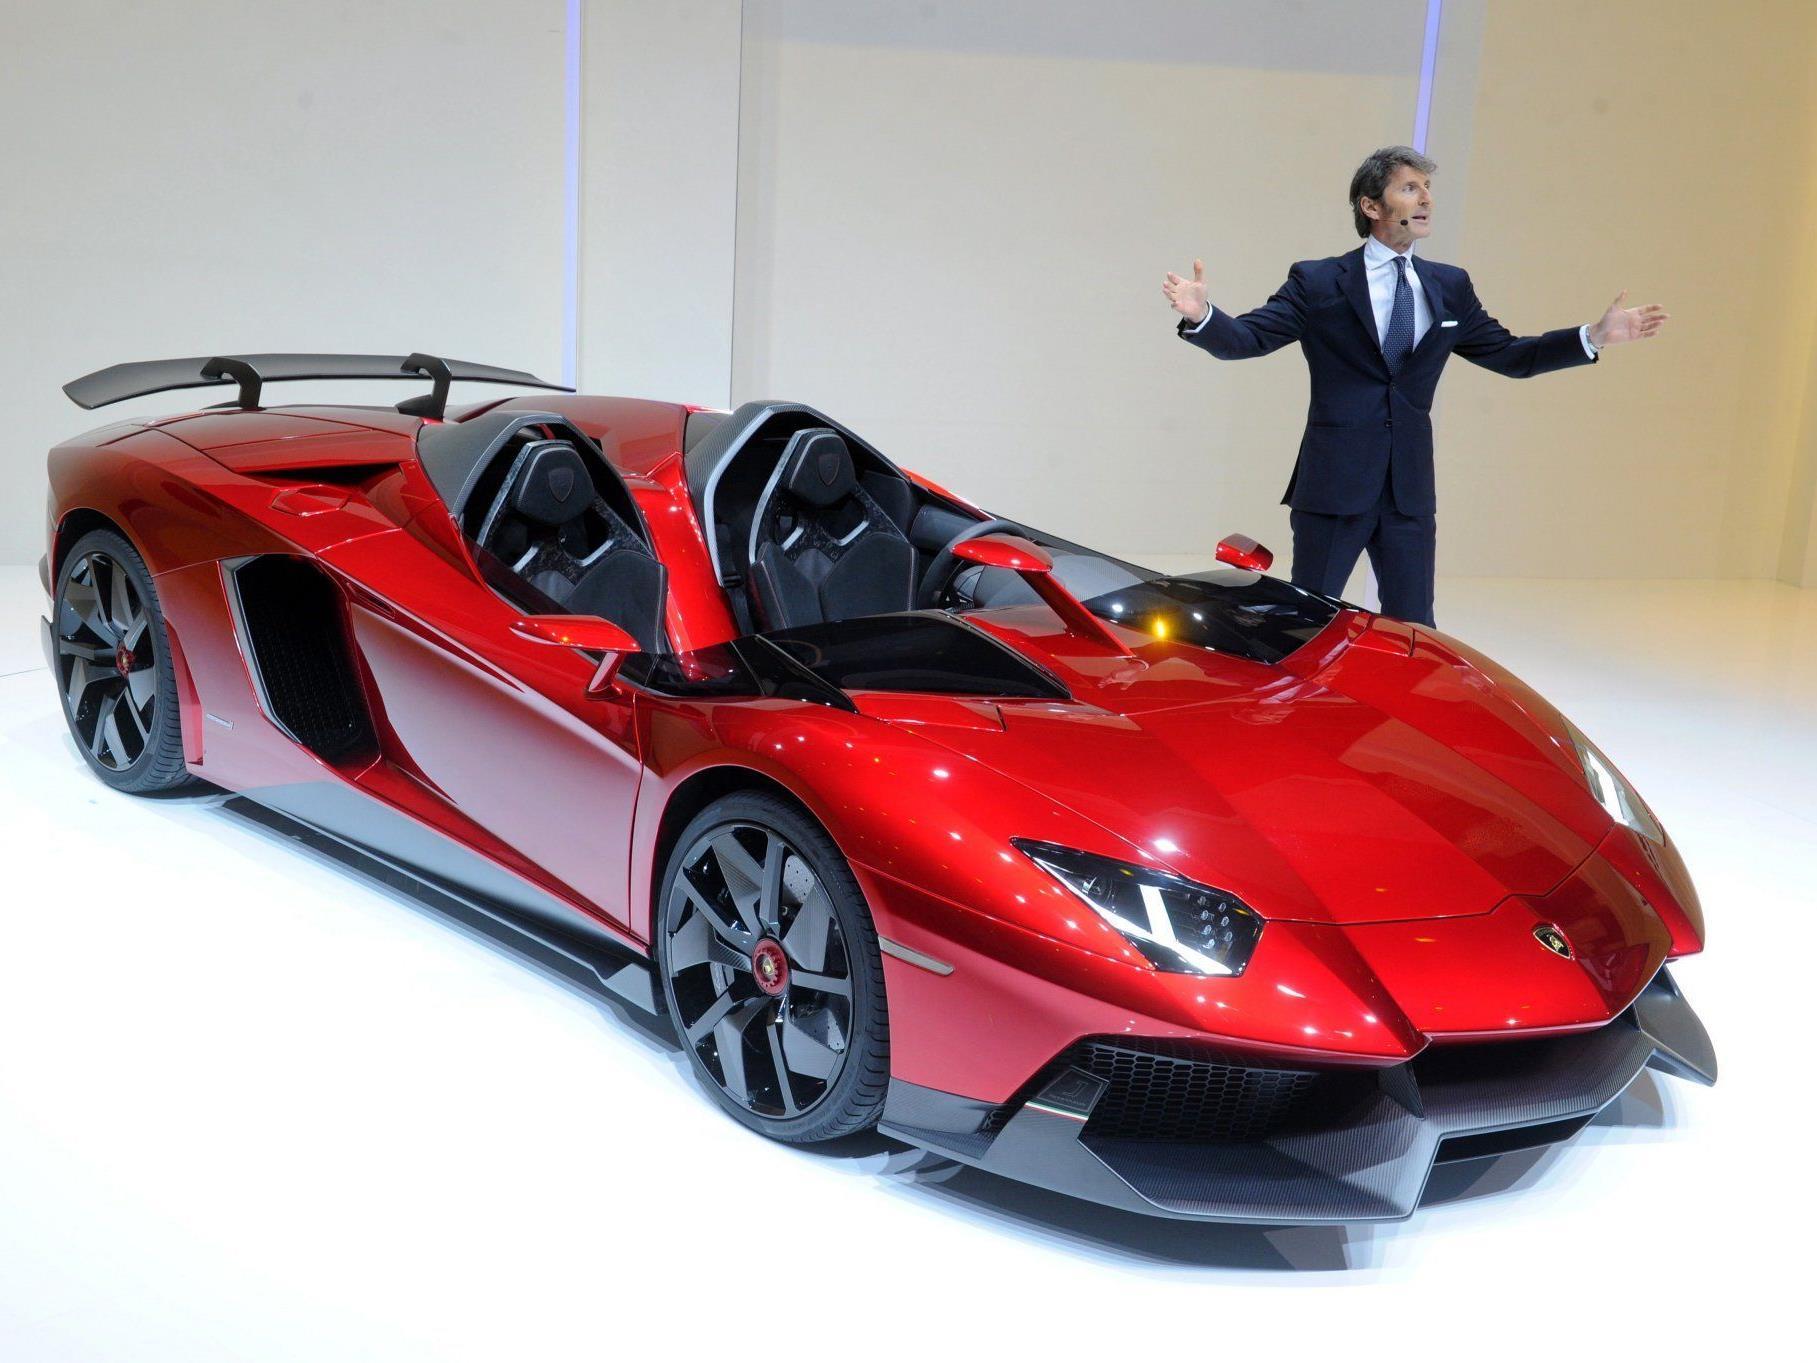 Lamborghini-Chef Stephan Winkelmann präsentiert den Lamborghini Mentador J.